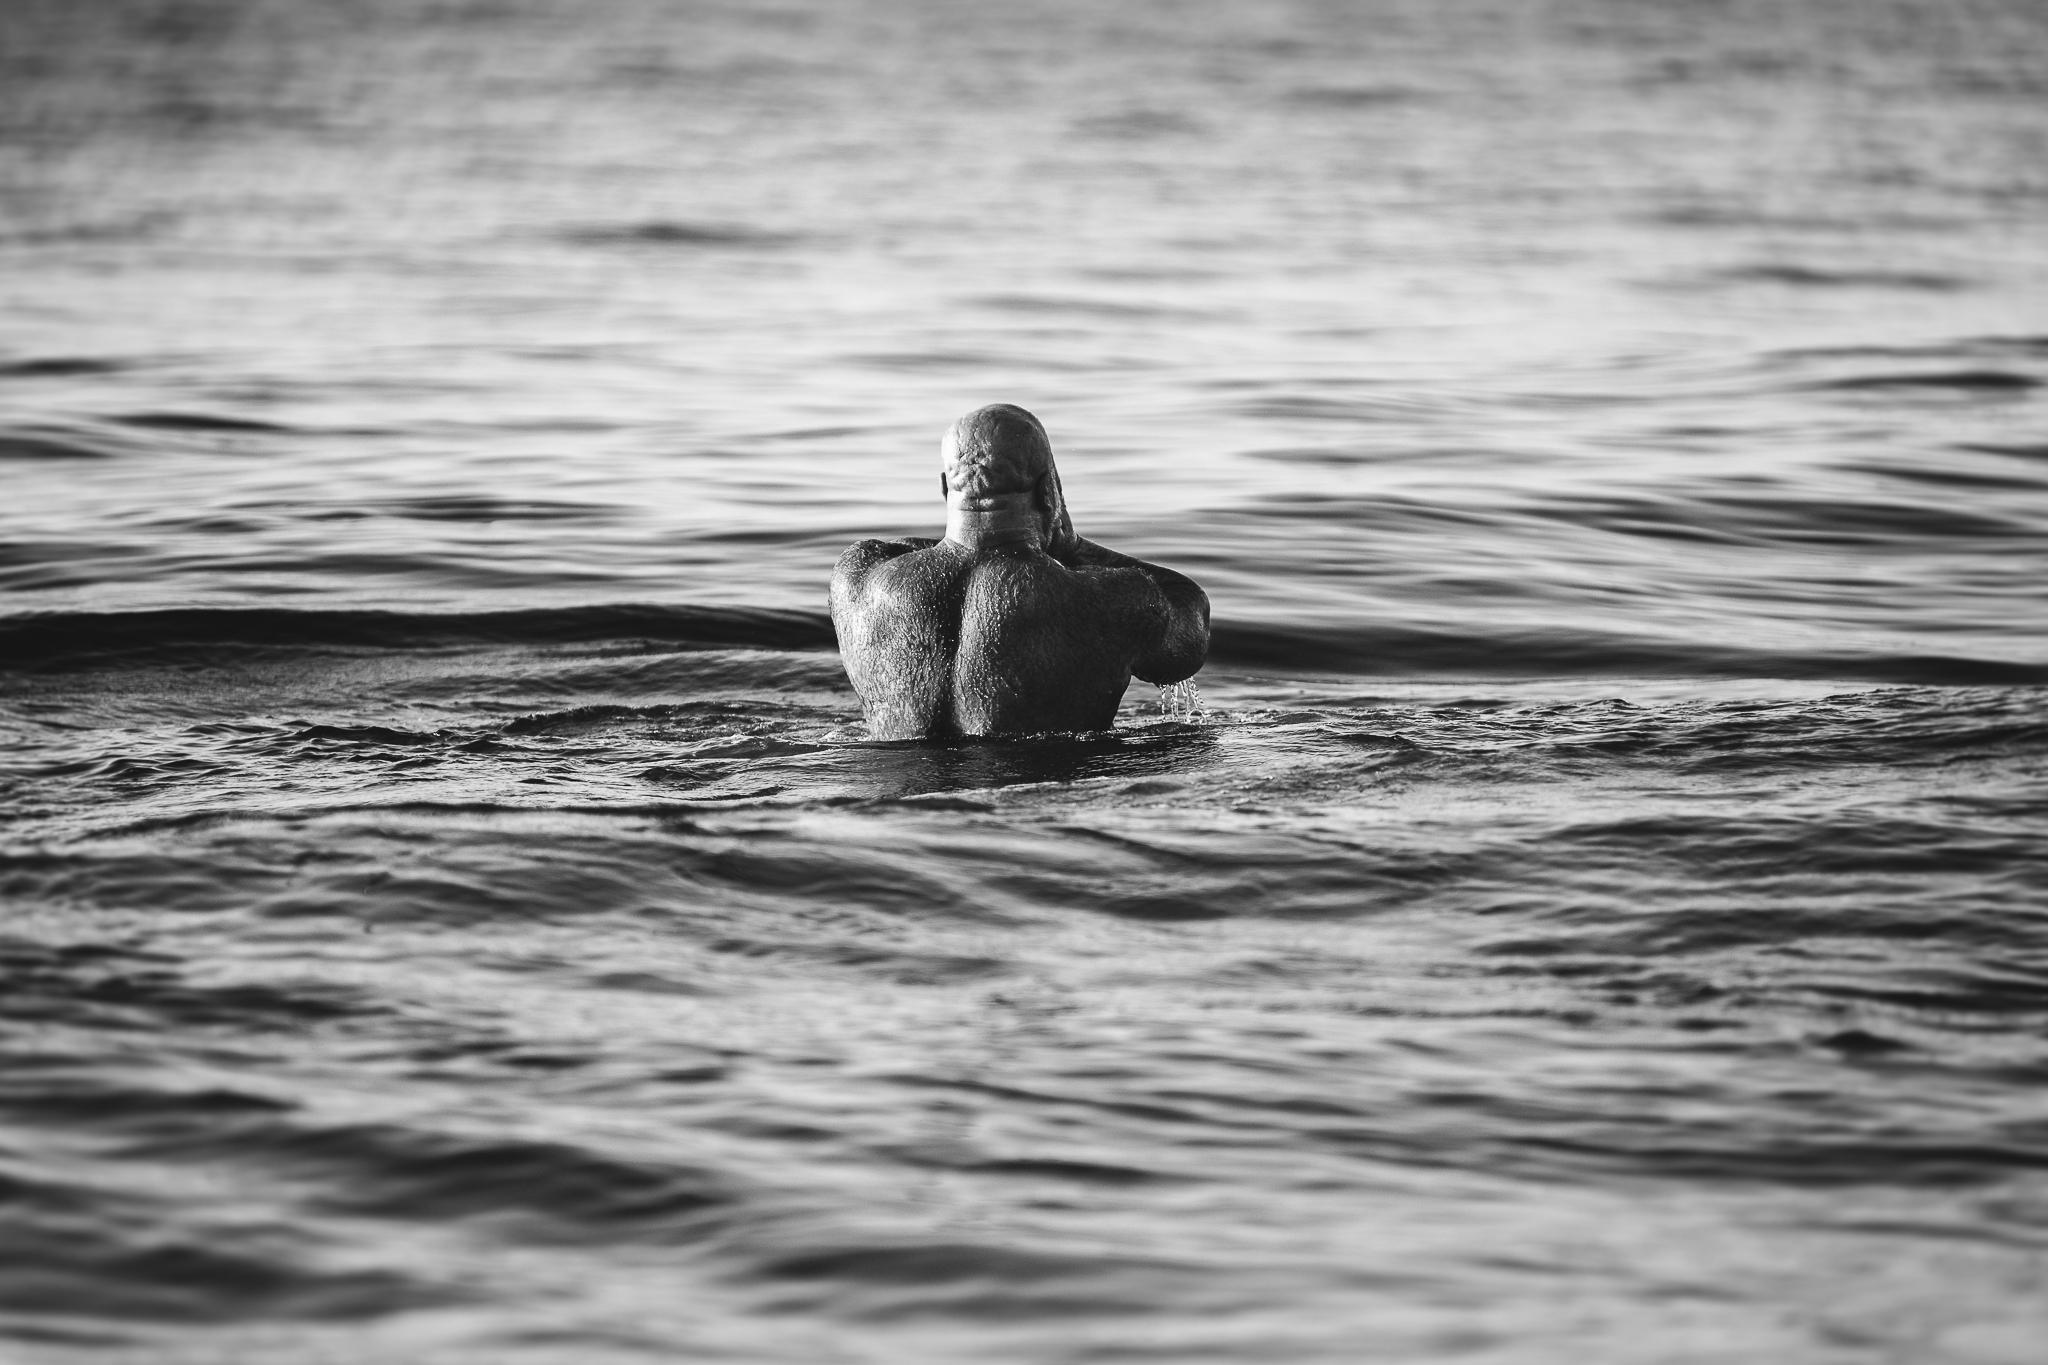 BeachGC-oliverzeukephotography-DSC0862312.jpg